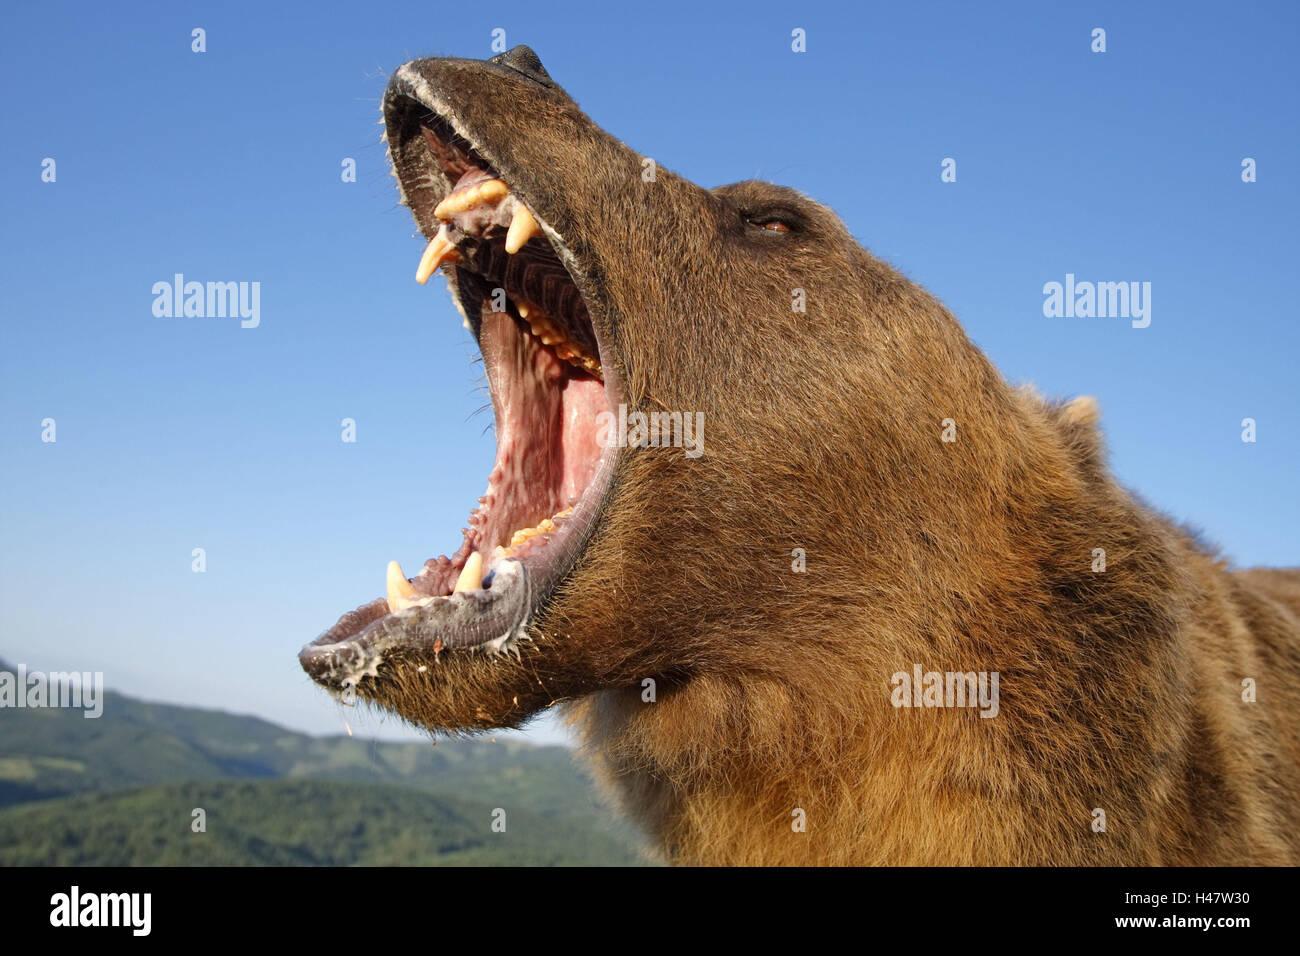 roar grizzly bear stock photos amp roar grizzly bear stock